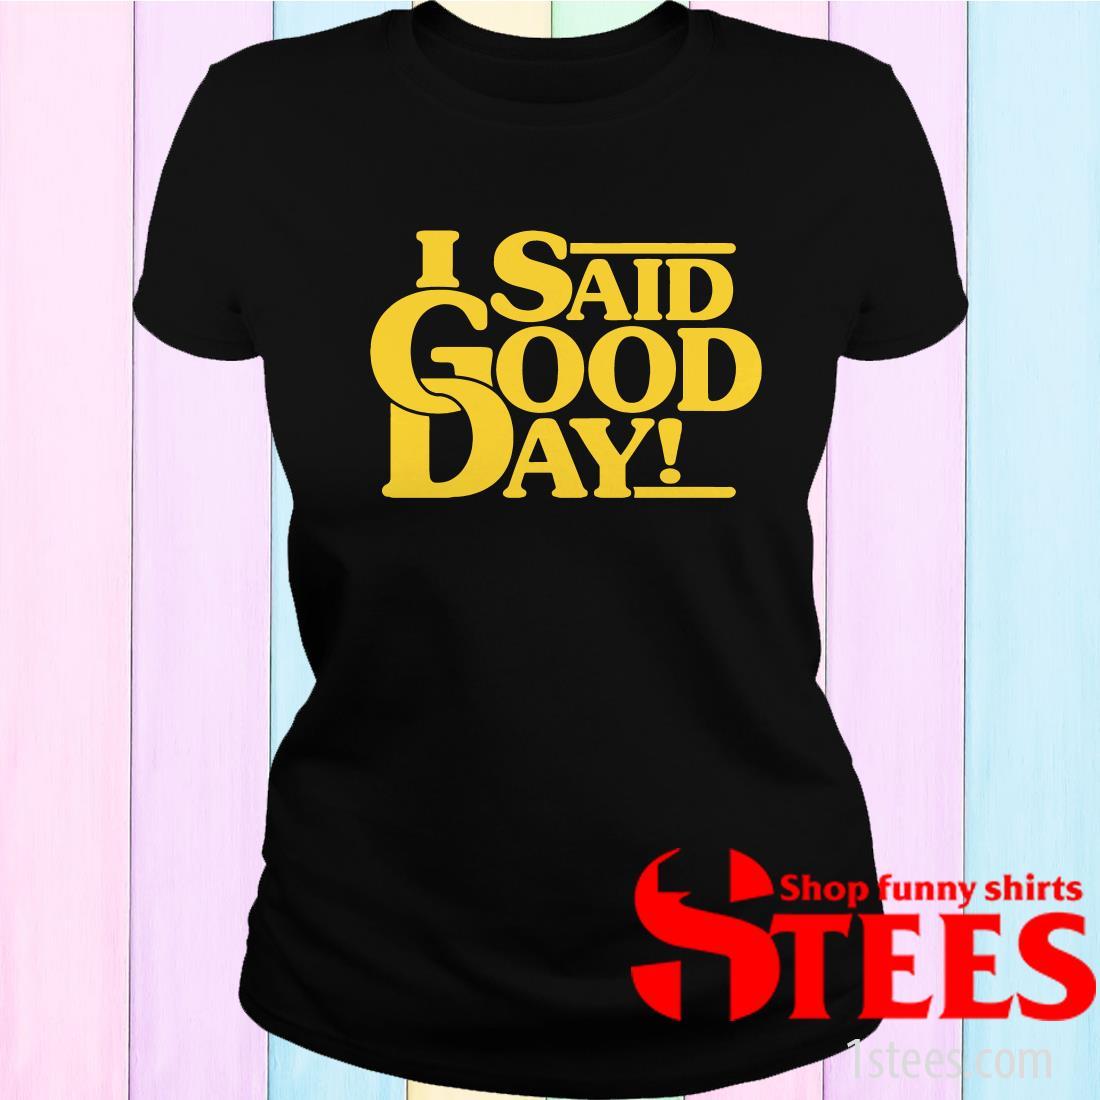 I Said Good Day Women's T-Shirt